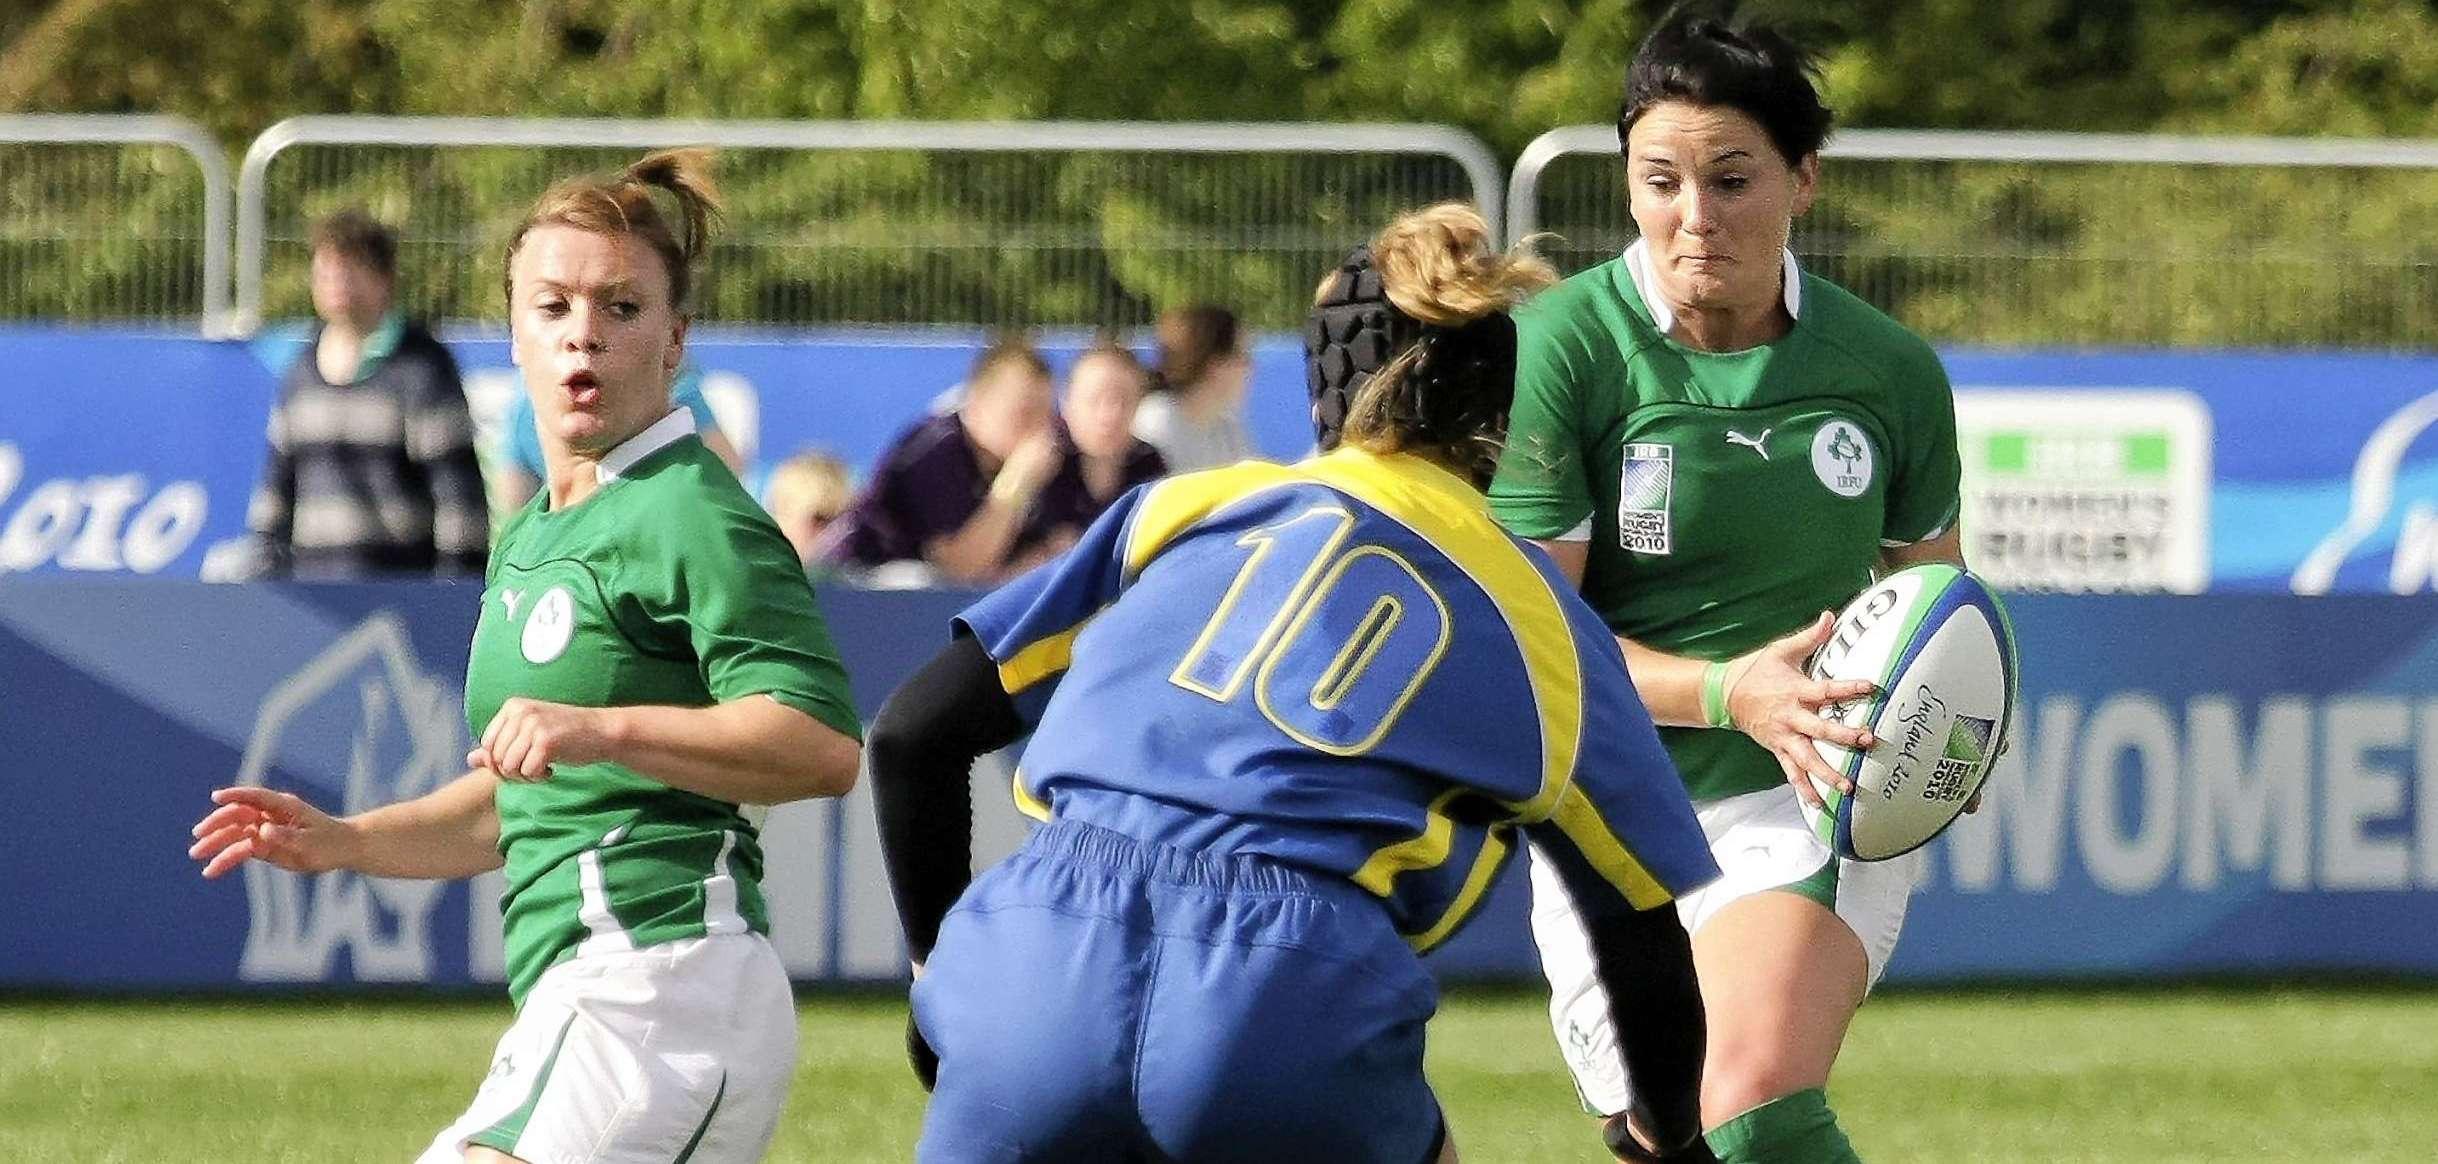 WRWC 2010: Ireland 37 Kazakhstan 3